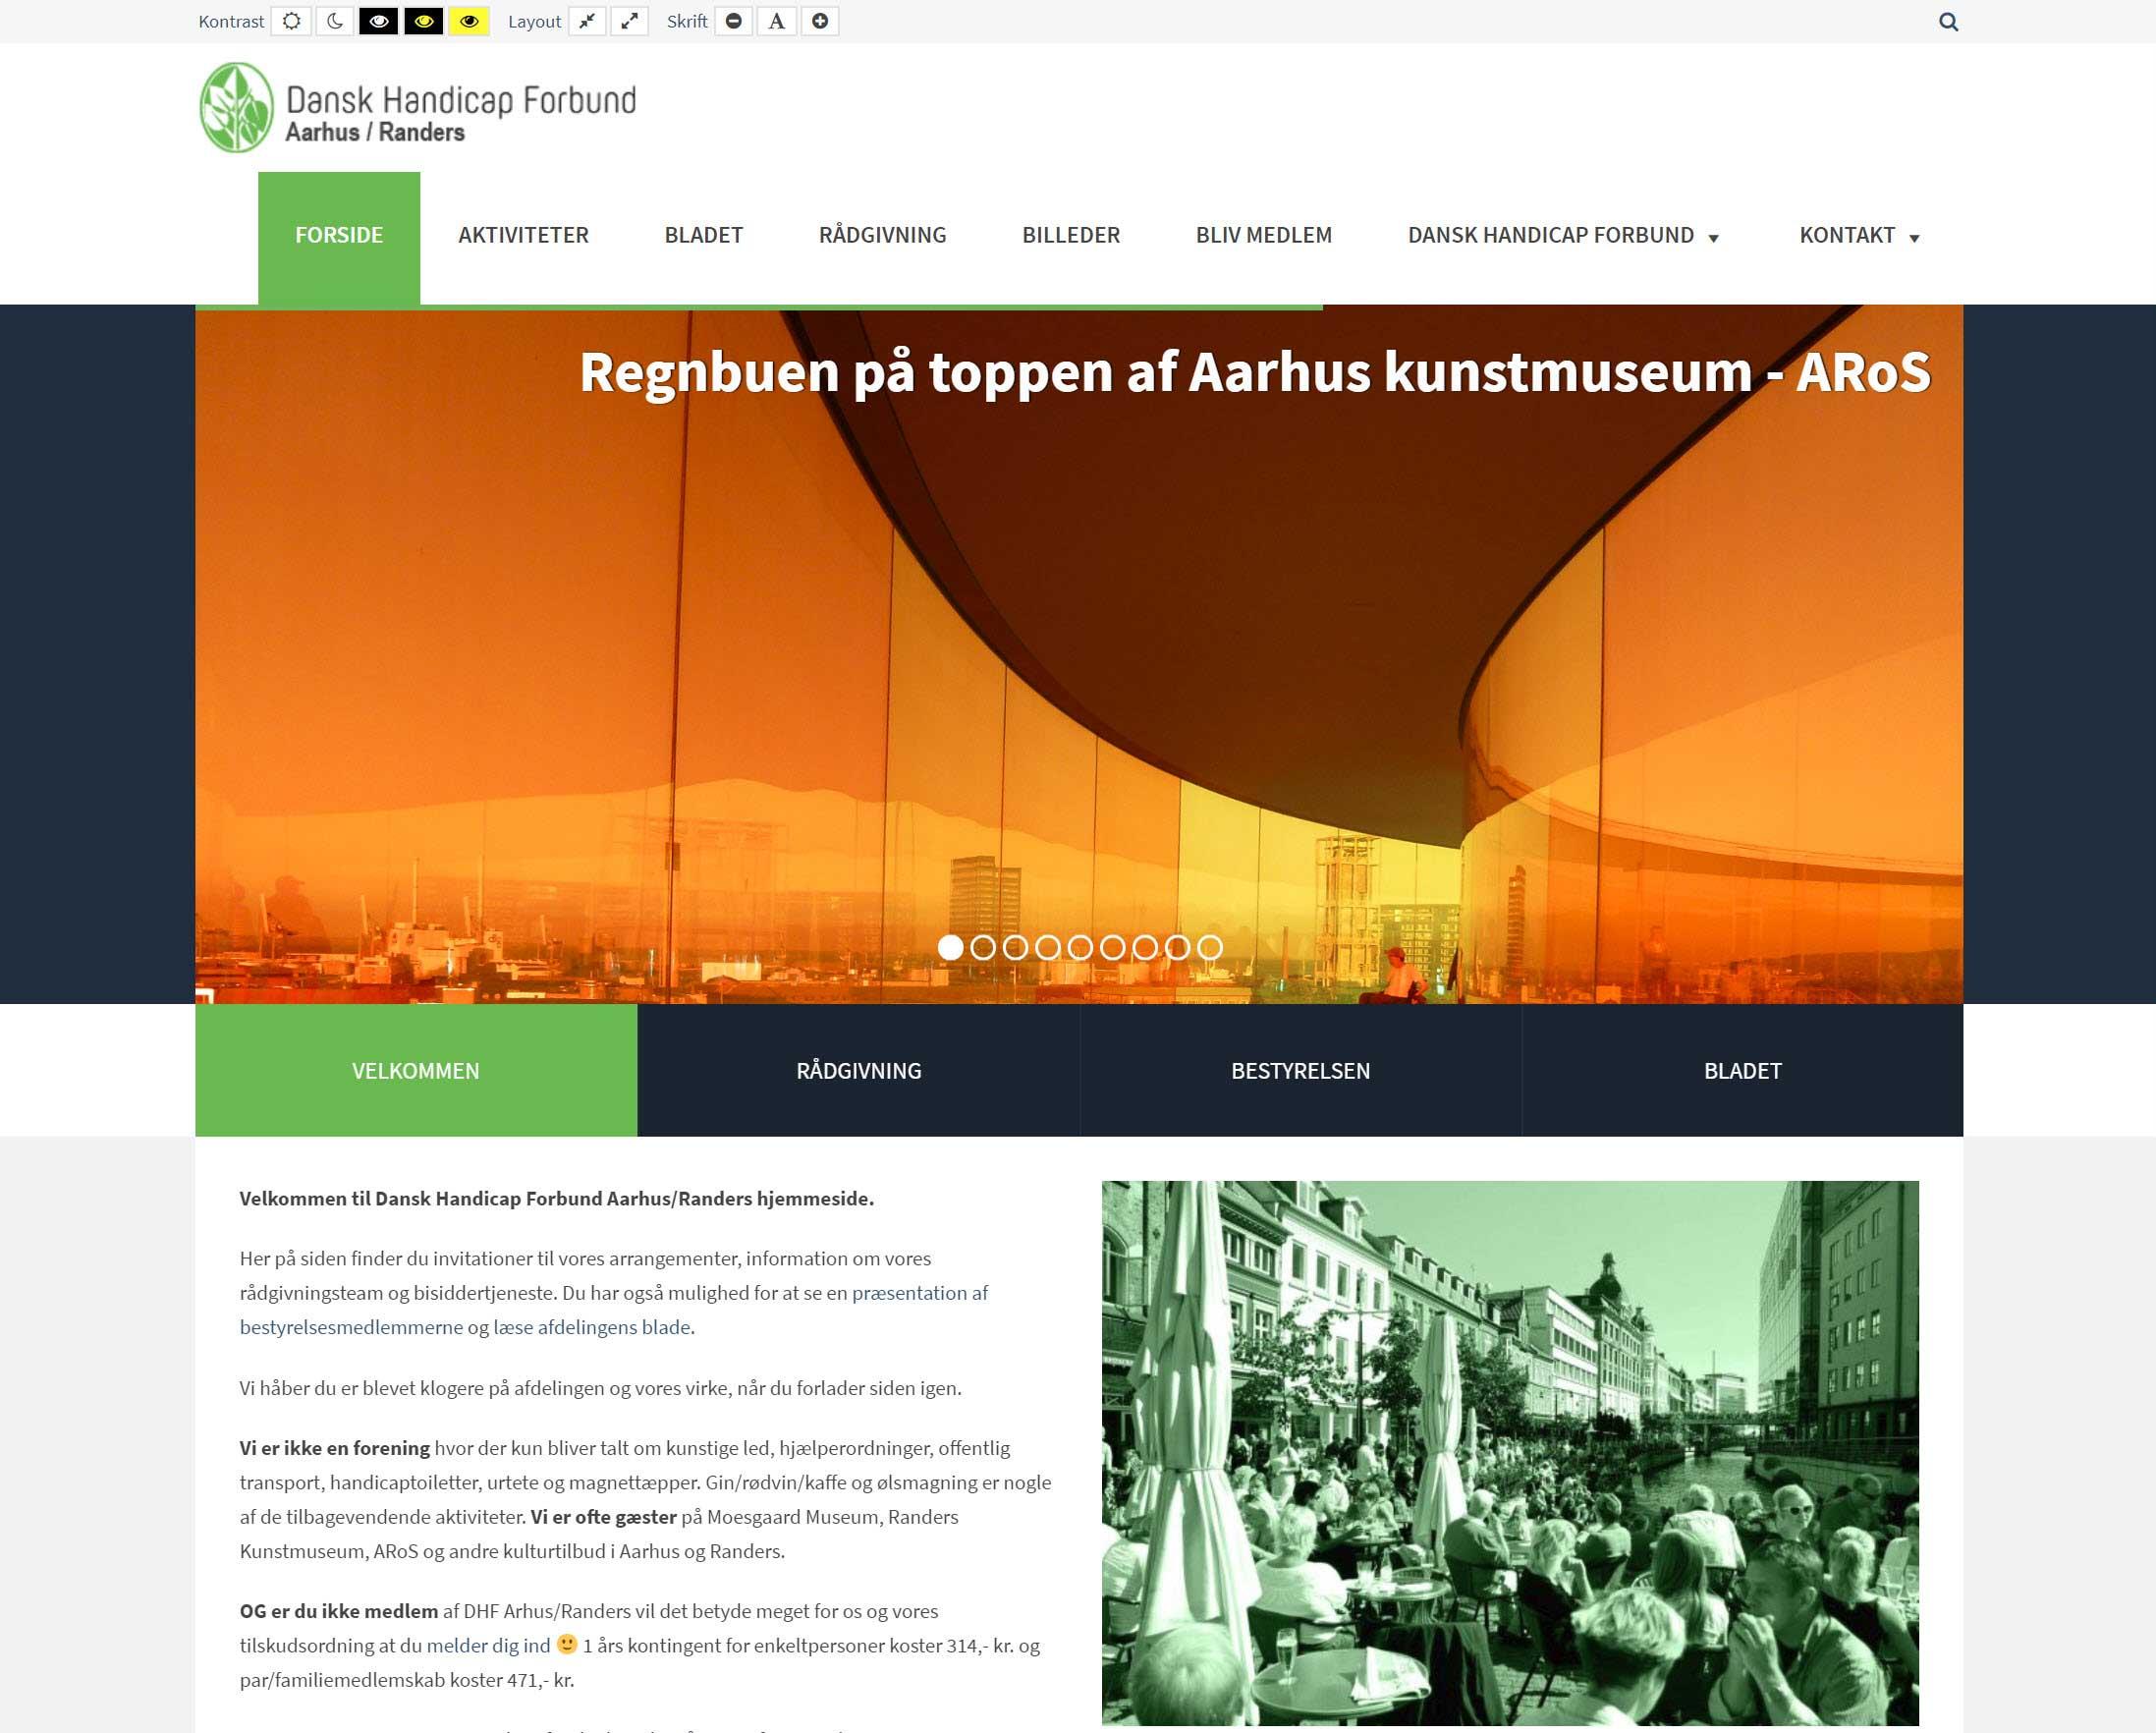 Dansk Handicap Forbund Aarhus/Randers | I samarbejde med MEDIE-GRAFIK